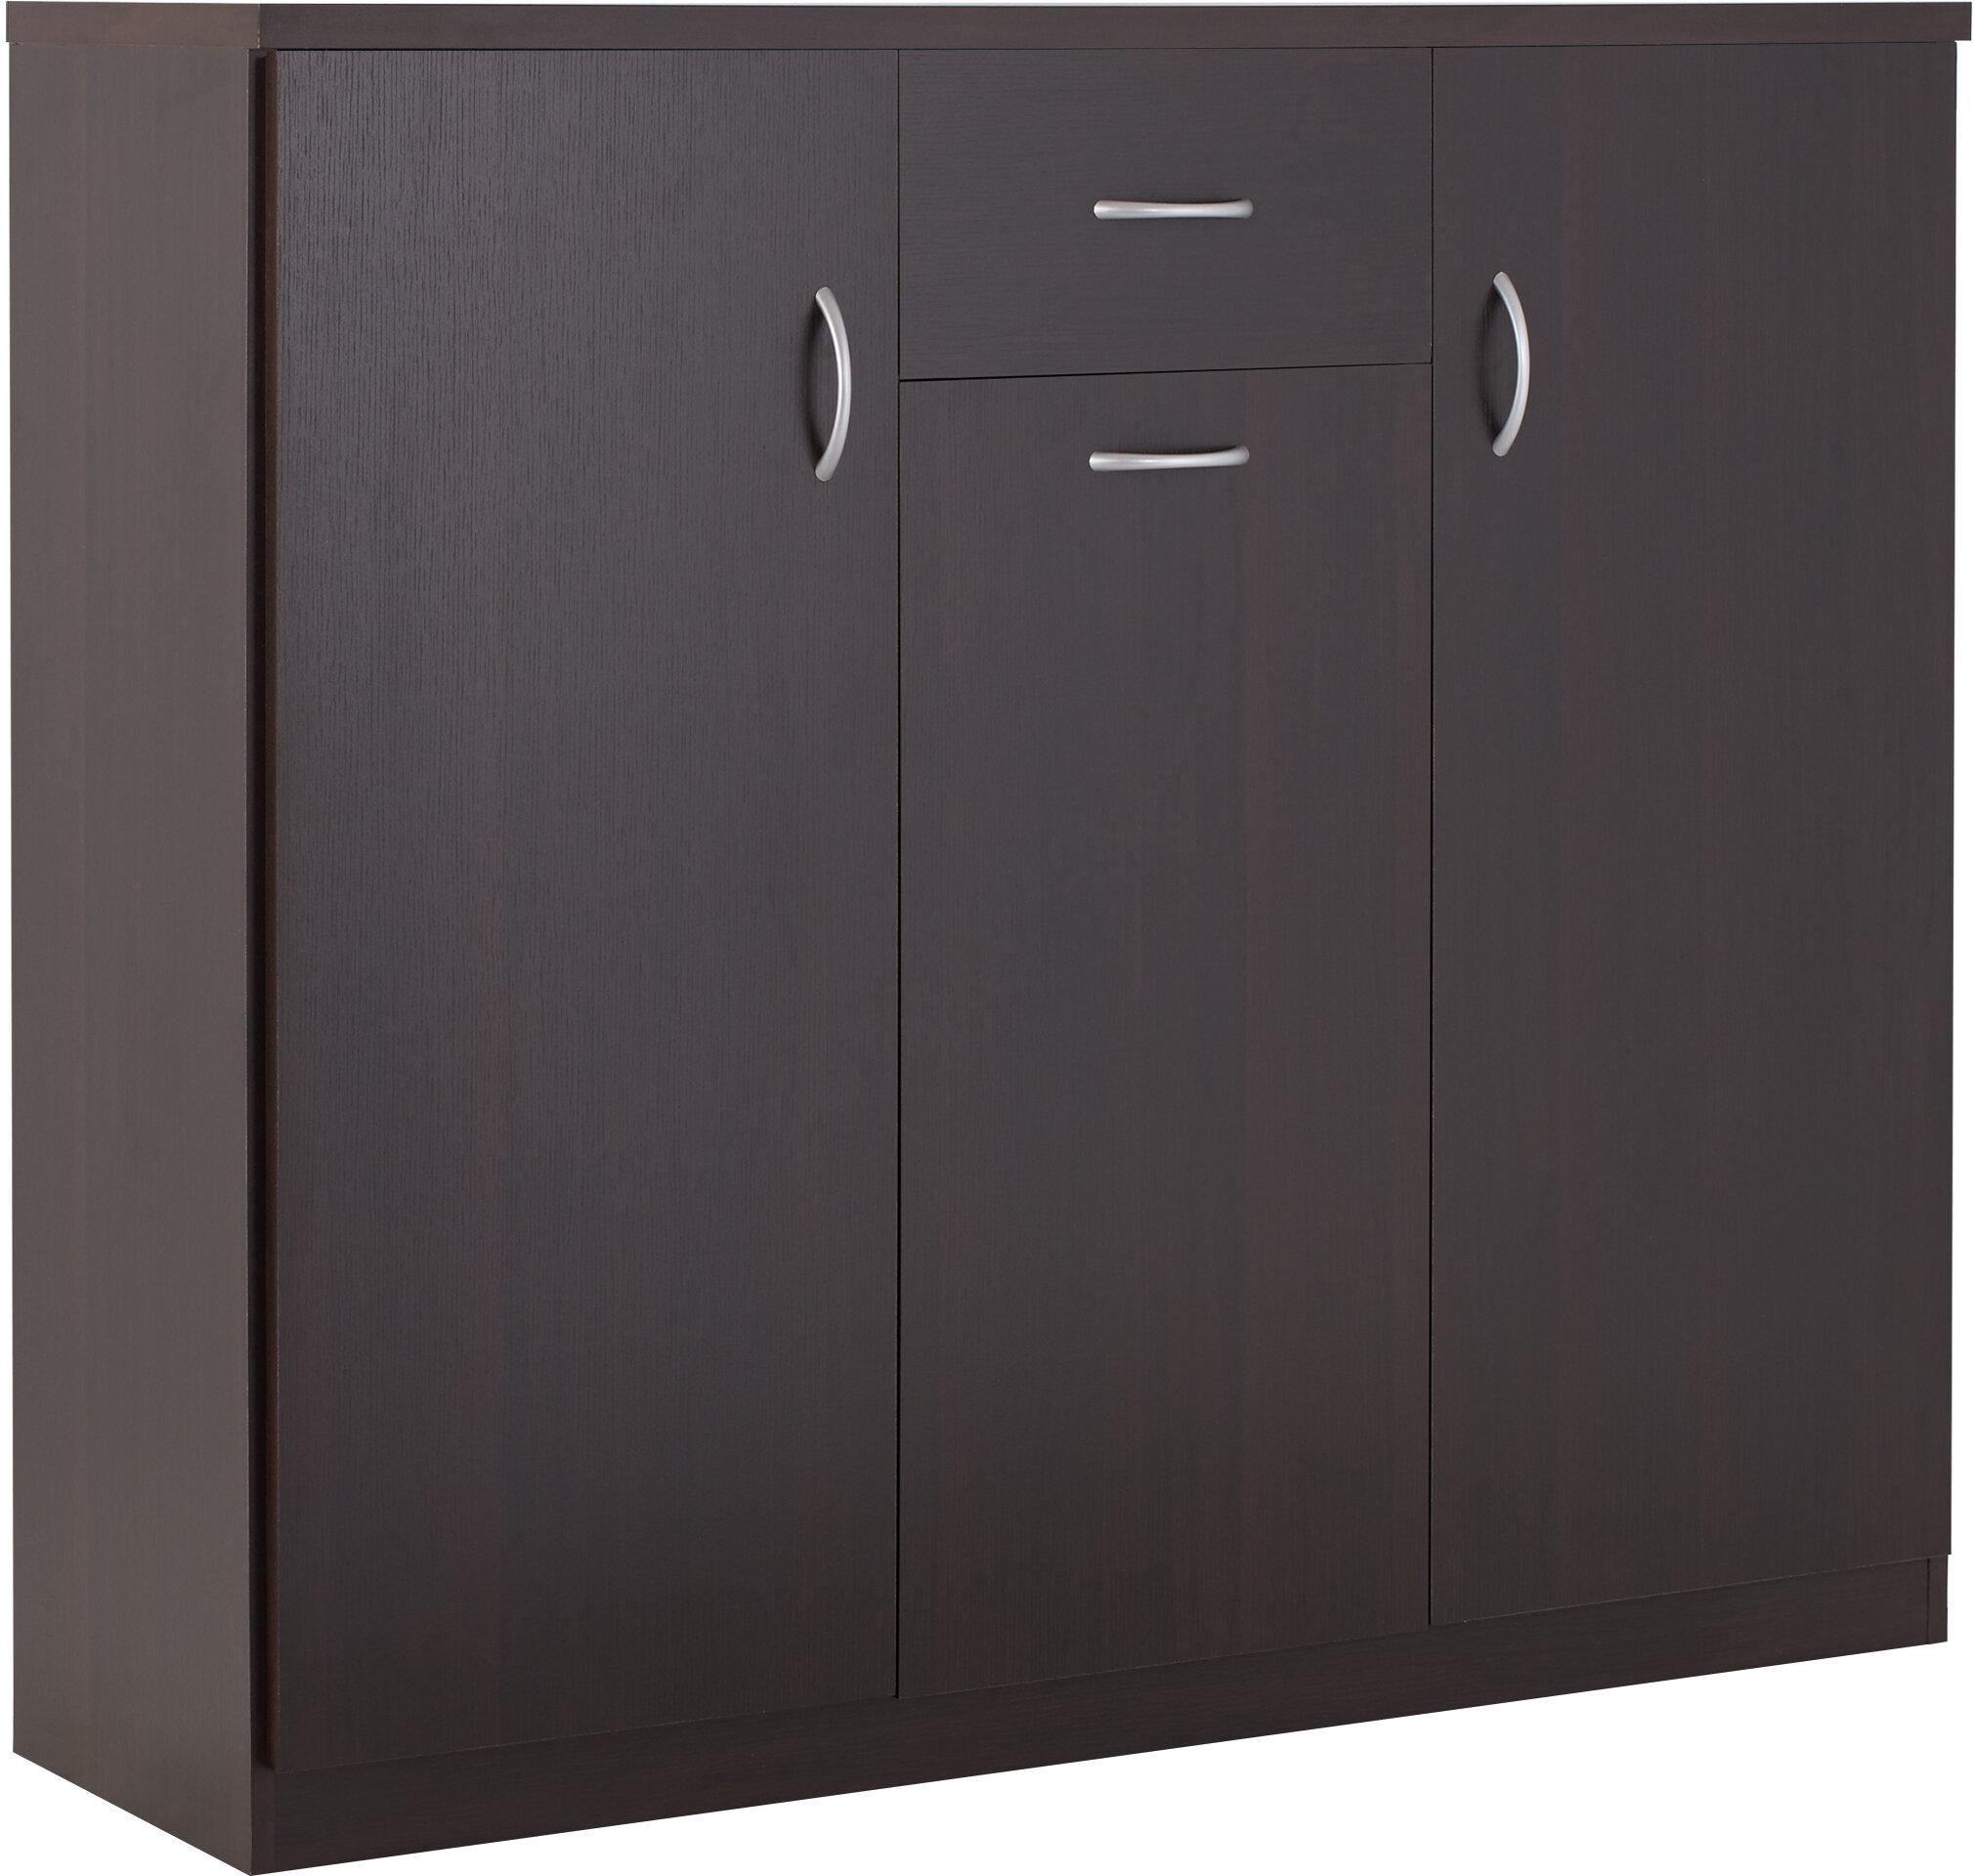 Wood 30 Pair Shoe Storage Cabinet Reviews Allmodern